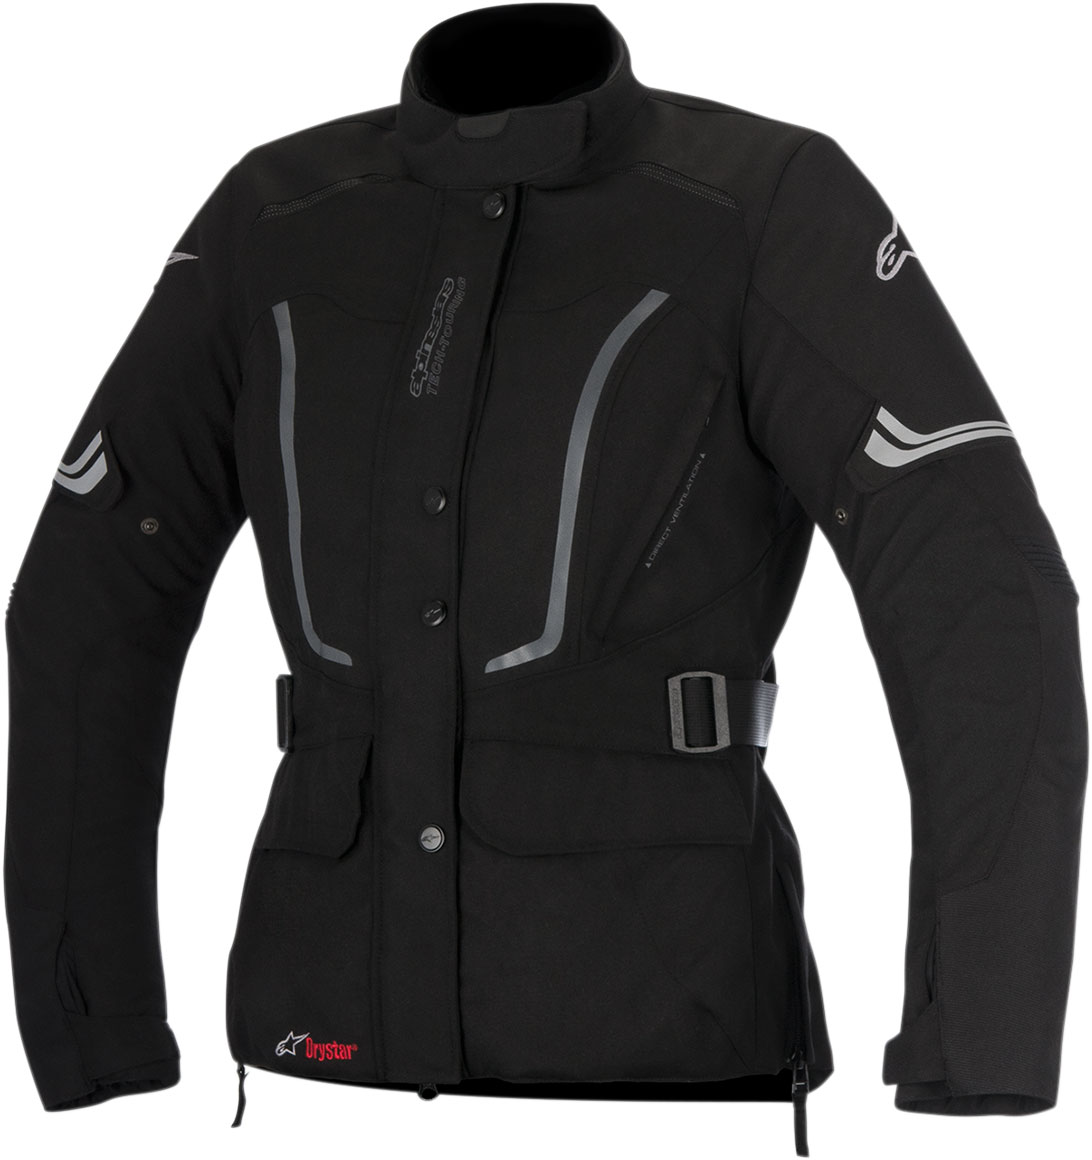 Alpinestars Stella VENCE Drystar Adventure-Touring Jacket (Black)